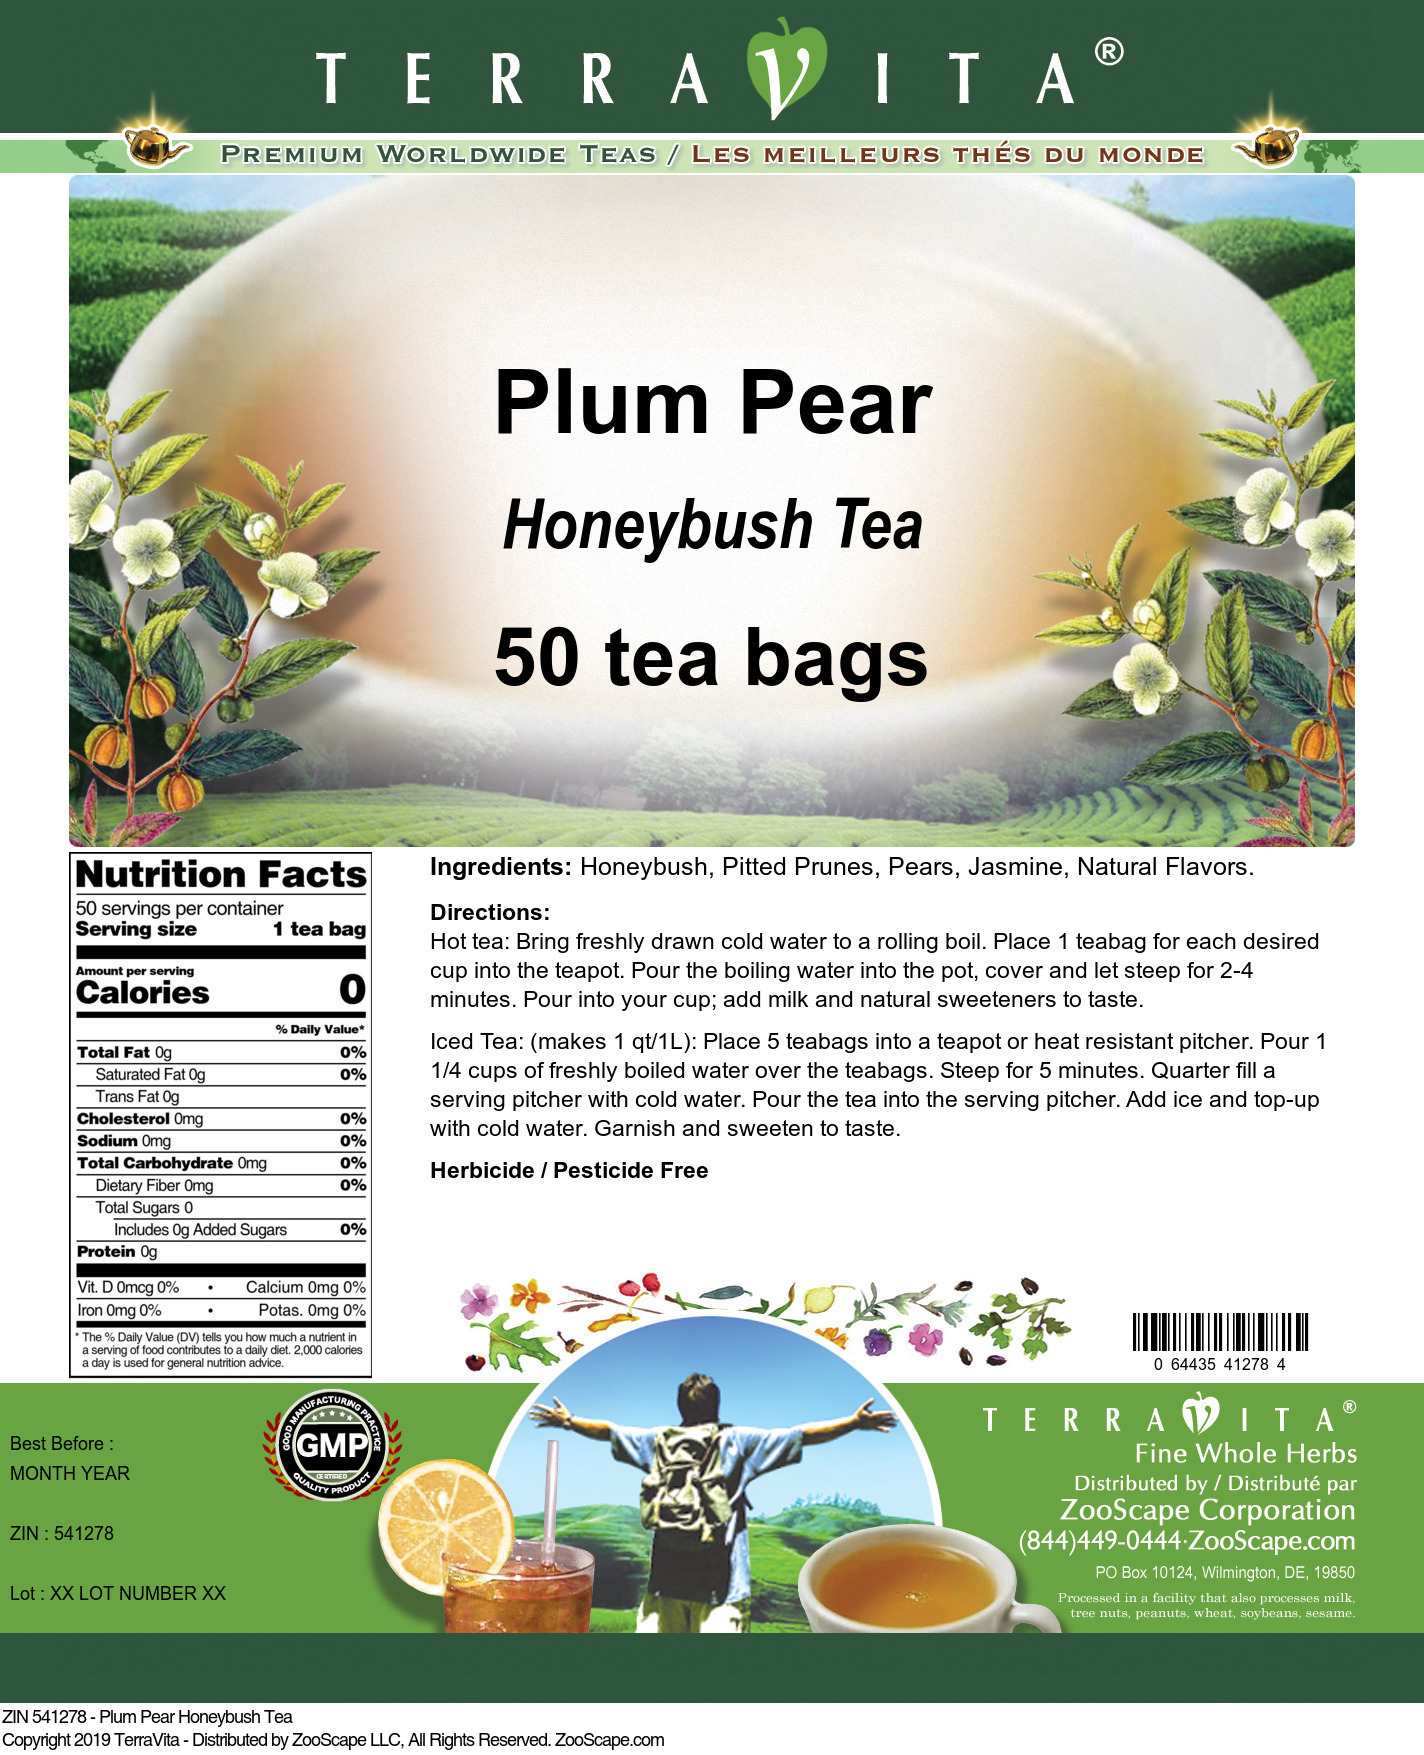 Plum Pear Honeybush Tea